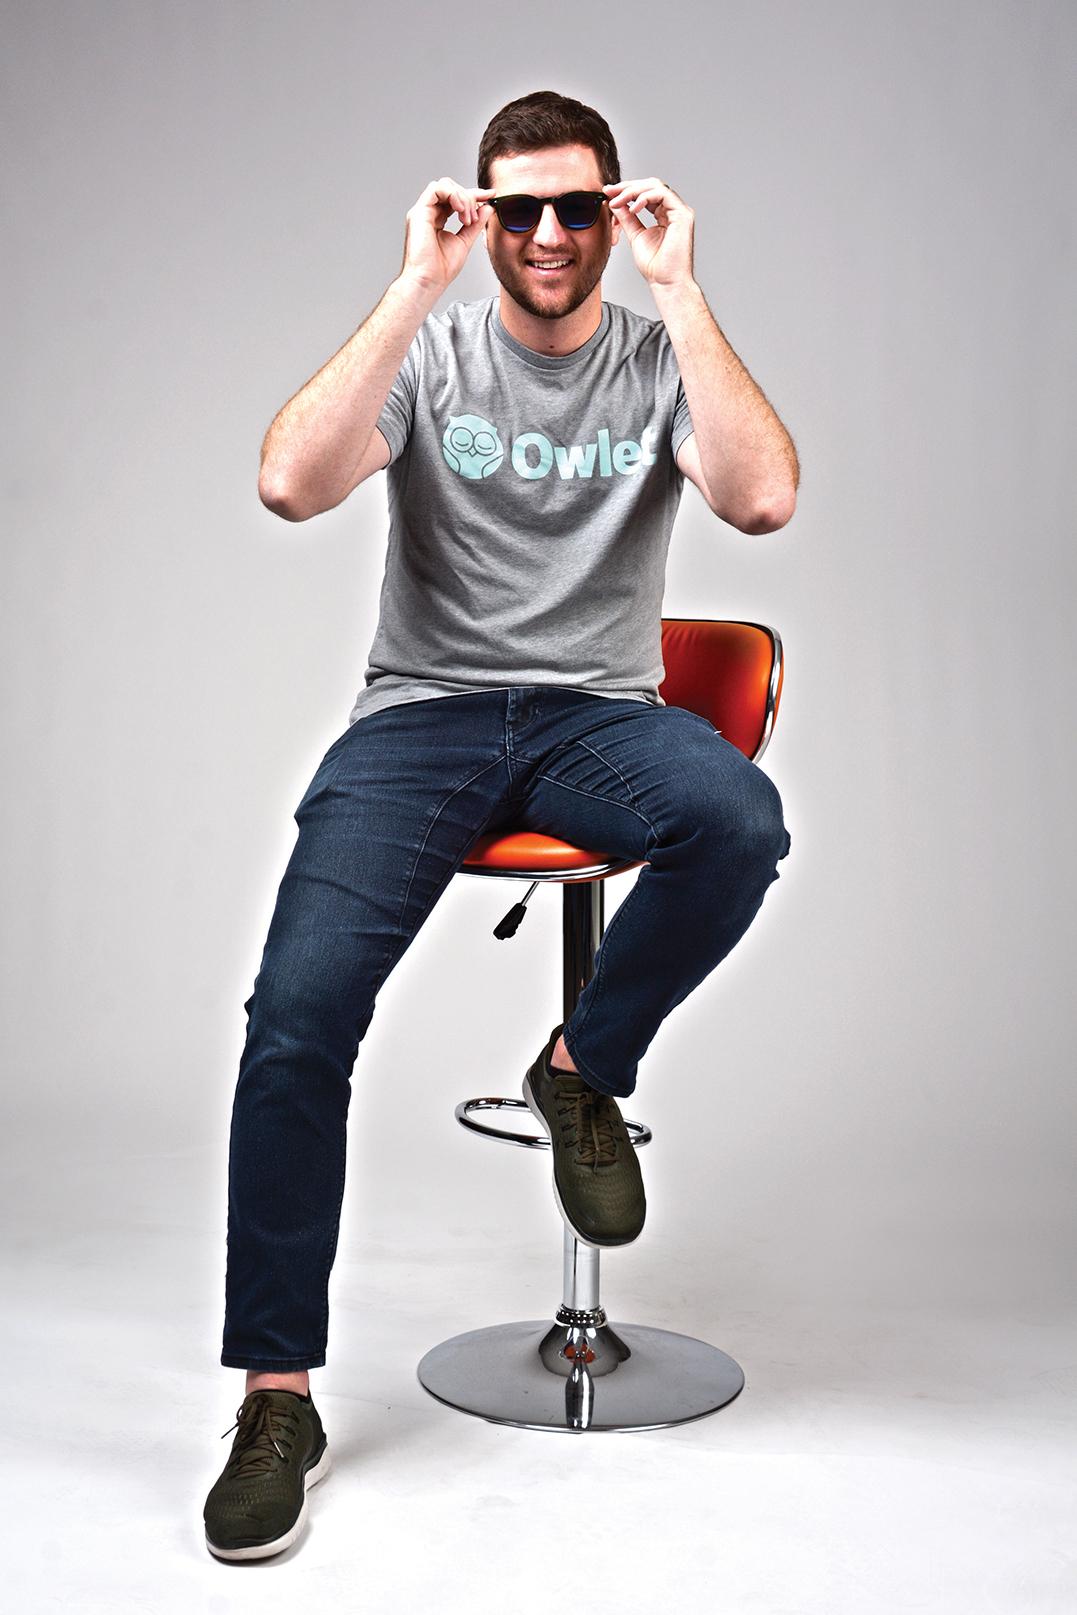 Coolest Entrepreneurs Kurt Workman Owlet Baby Care